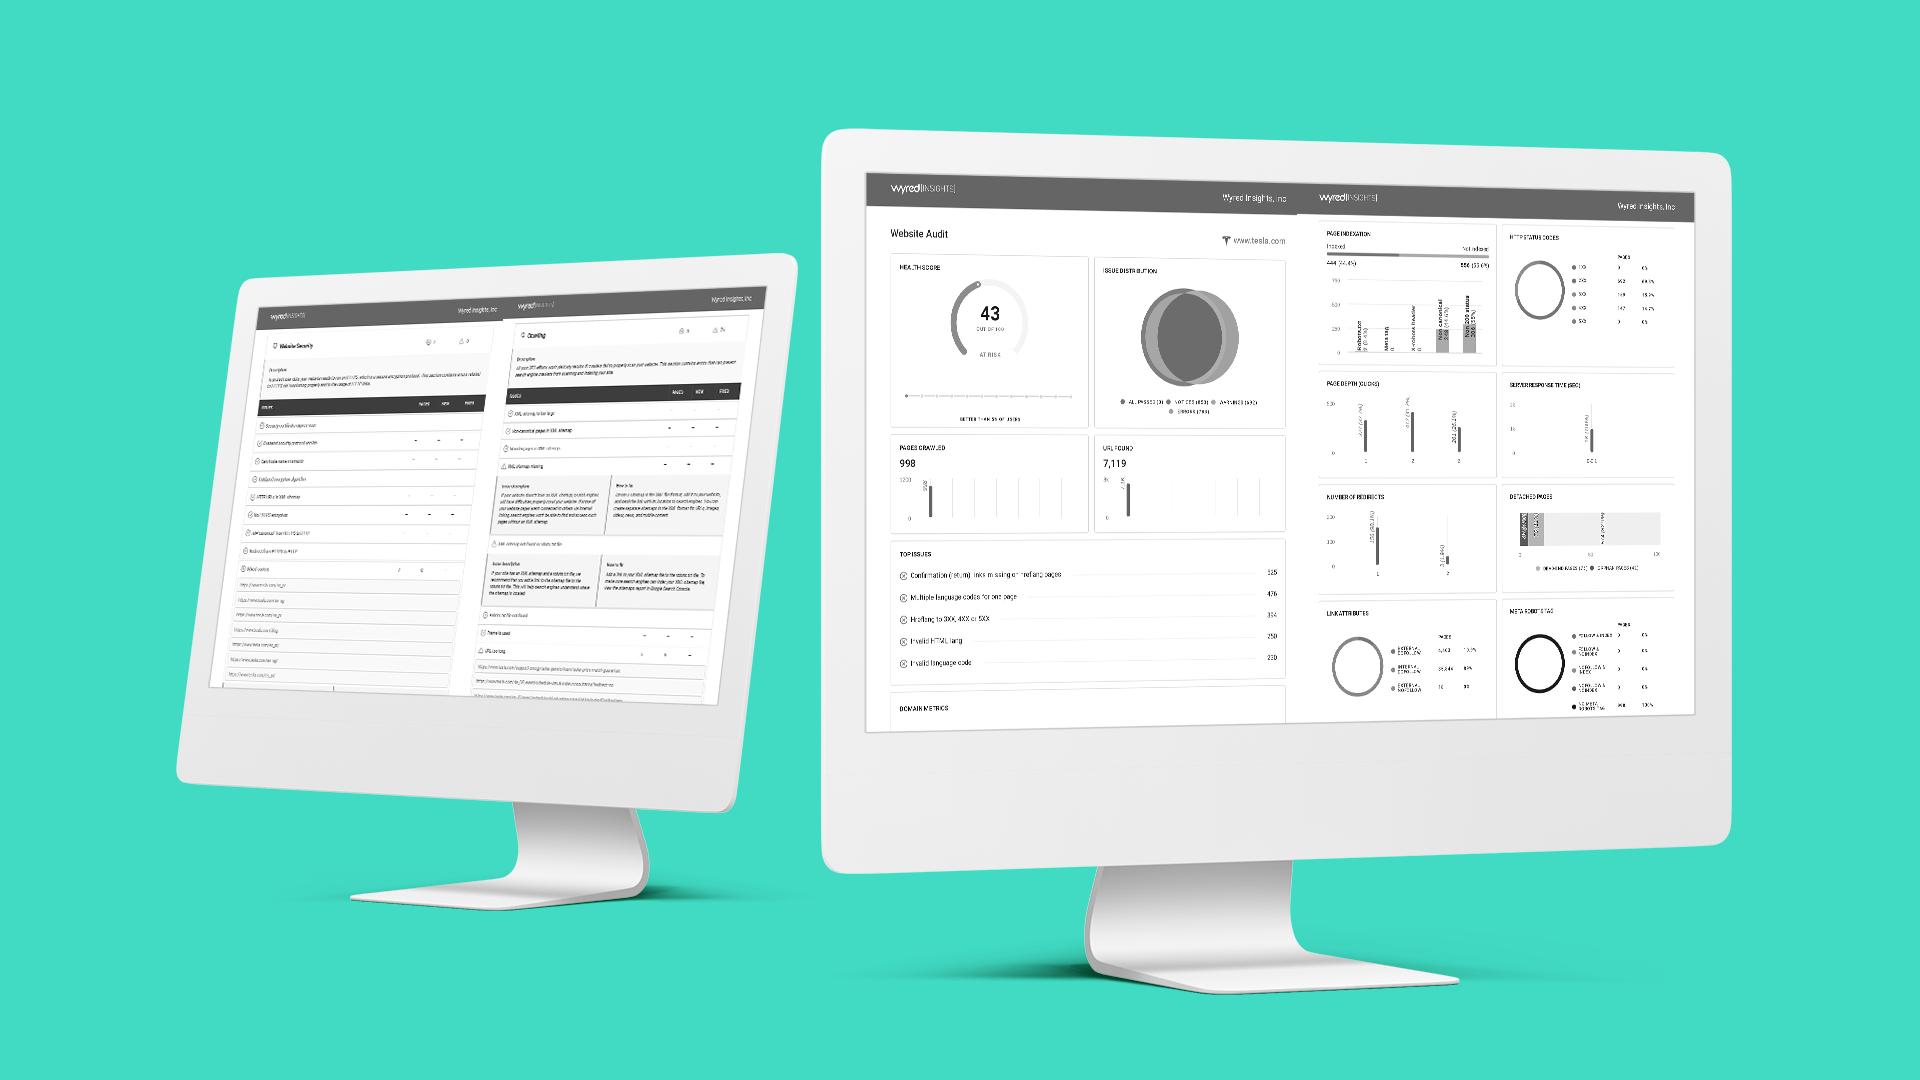 FeaturedIMG-Website-Audit-2